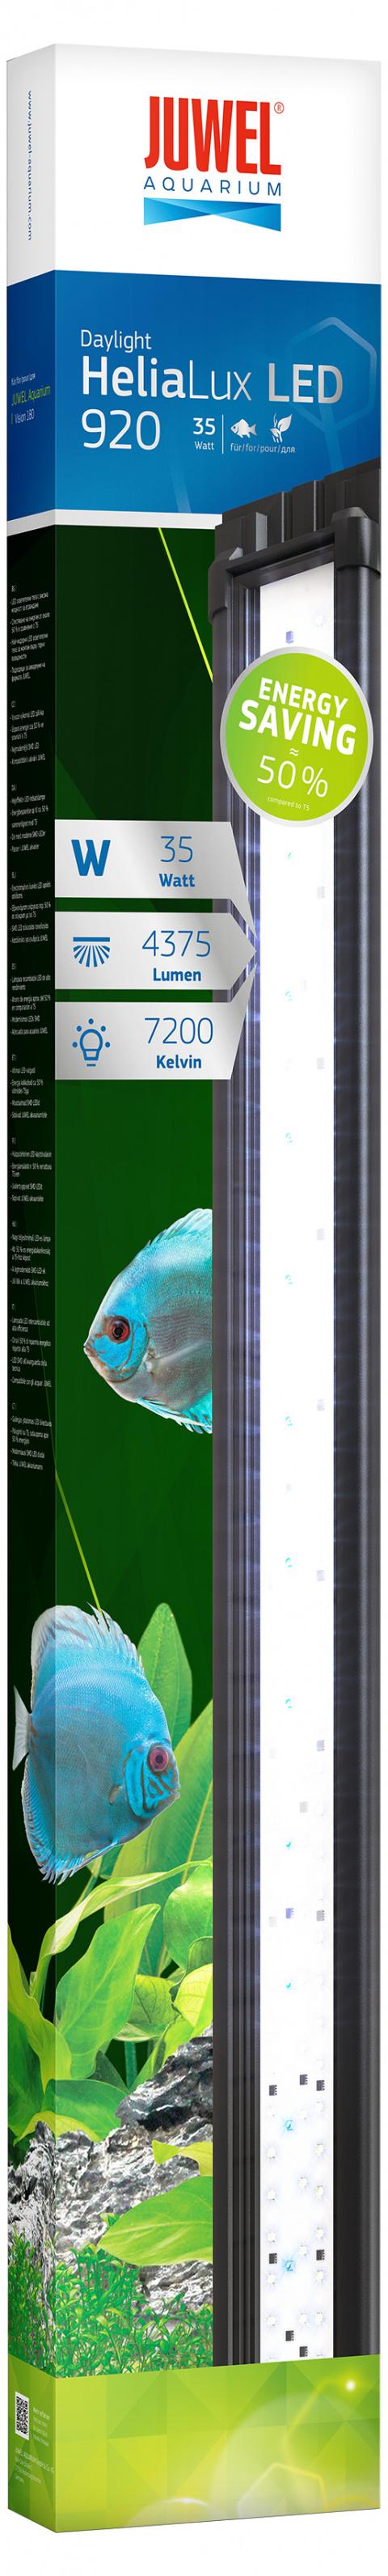 Dienas gaisma akvārijam - Juwel Helia Lux LED 920, 35 W